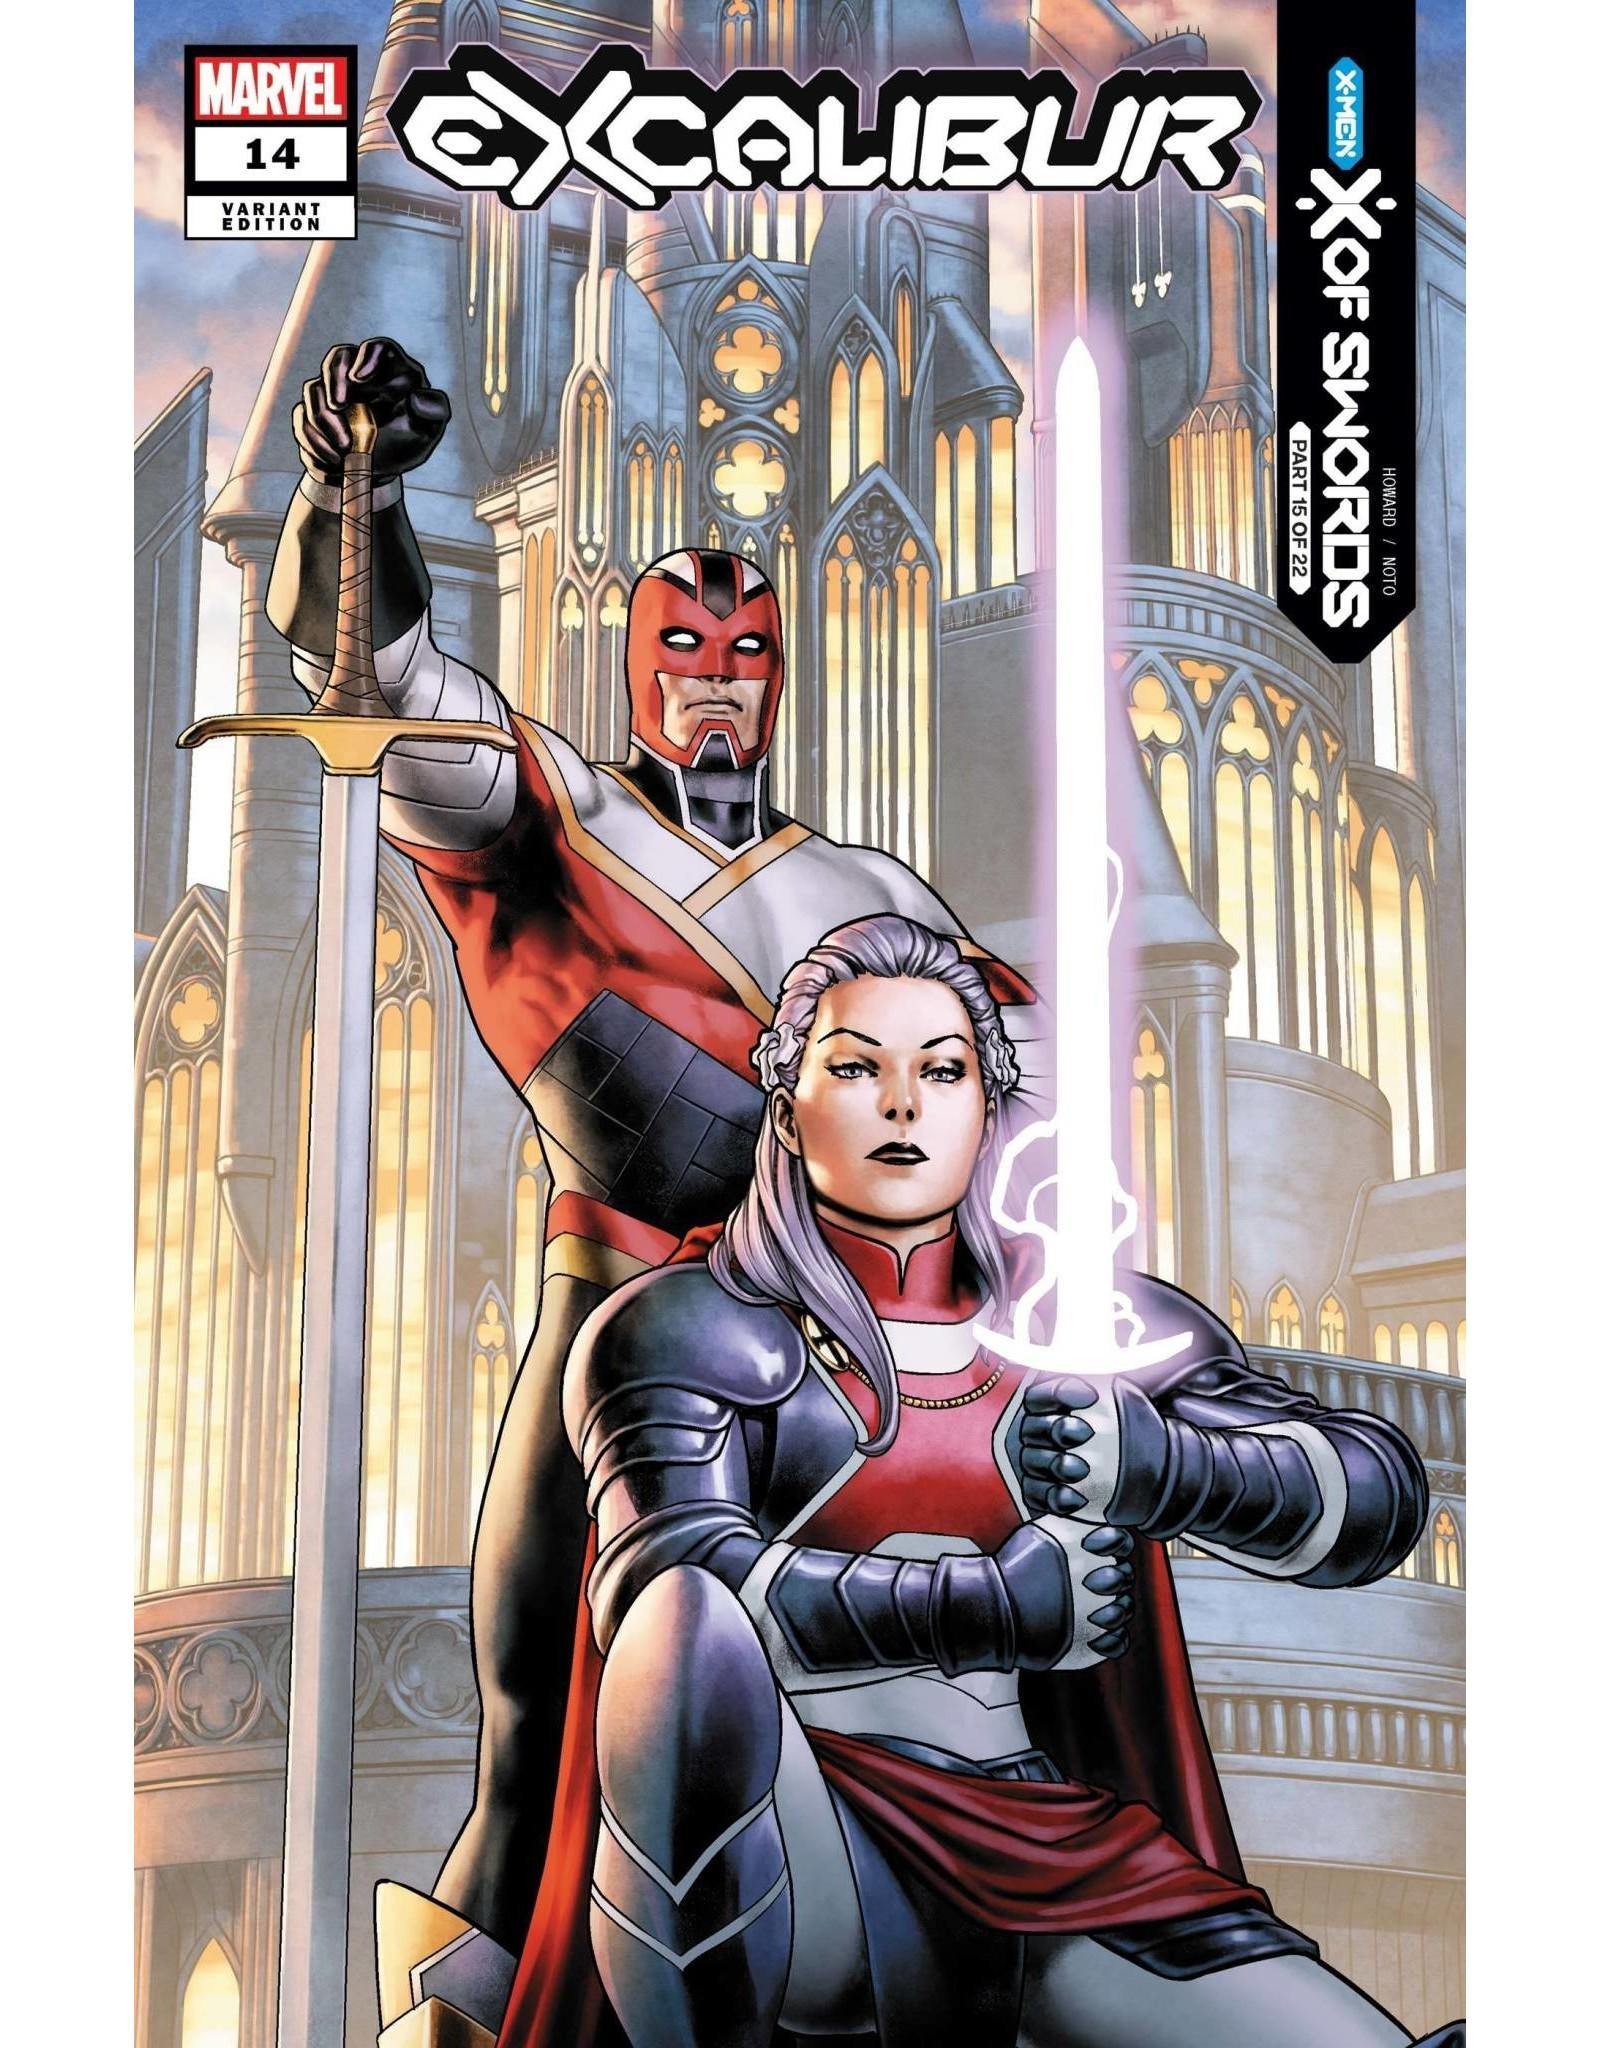 Marvel Comics EXCALIBUR #14 SAIZ VAR XOS